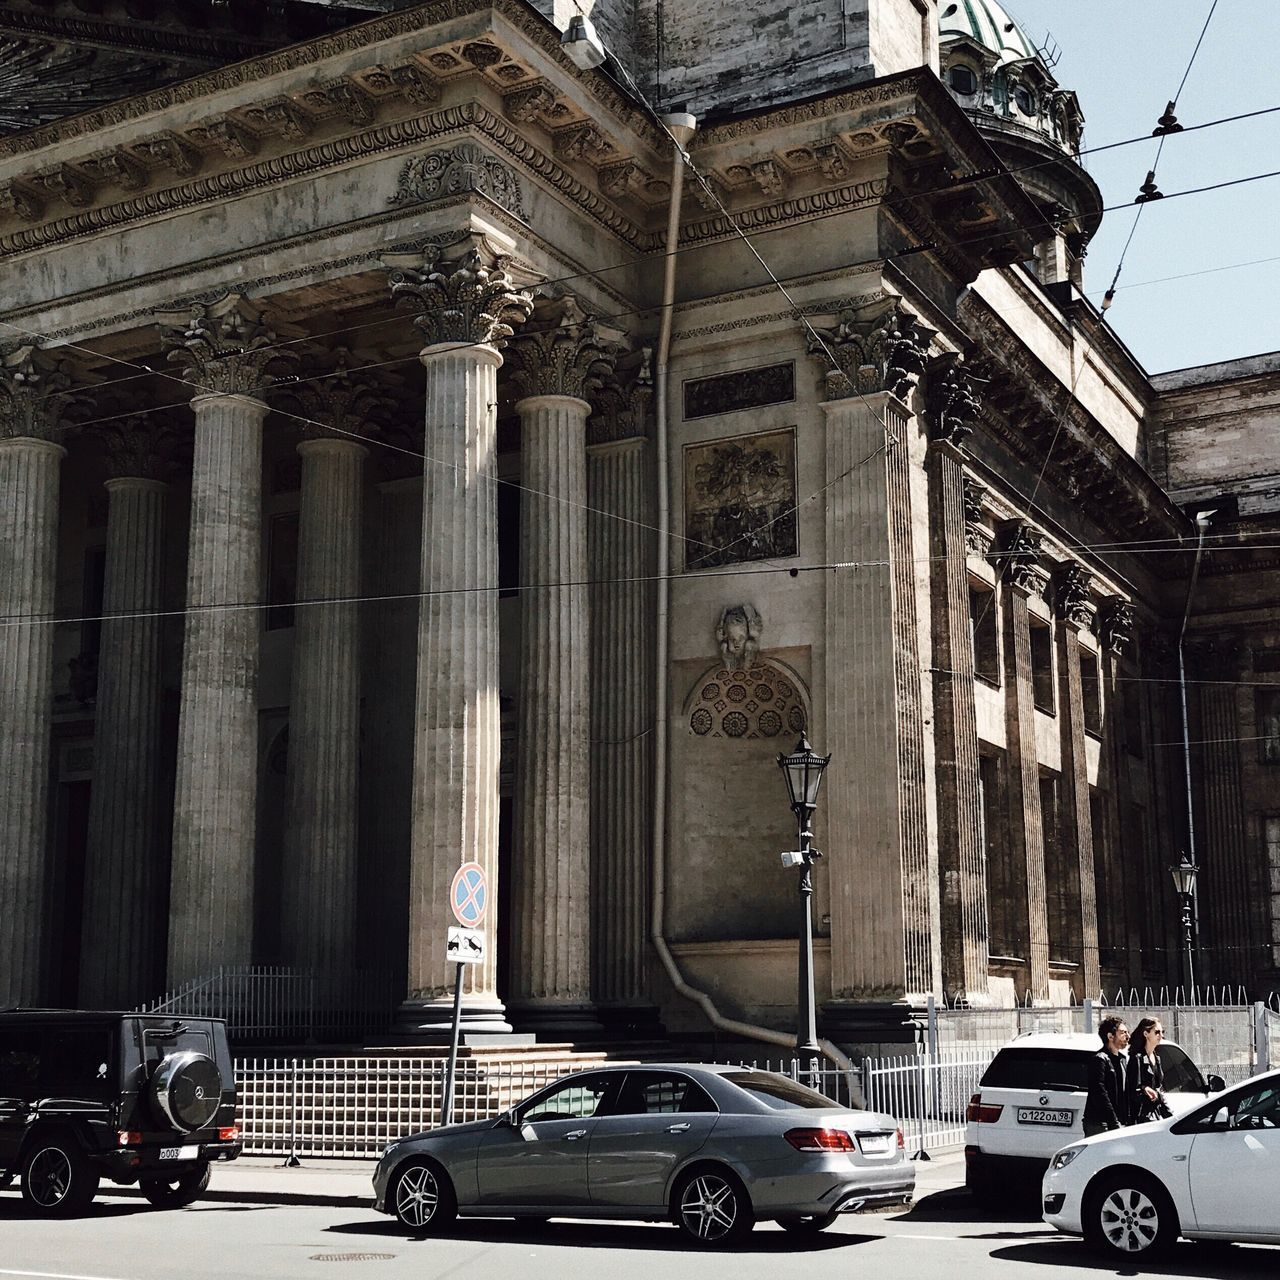 architecture, architectural column, building exterior, built structure, car, transportation, day, land vehicle, outdoors, statue, travel destinations, no people